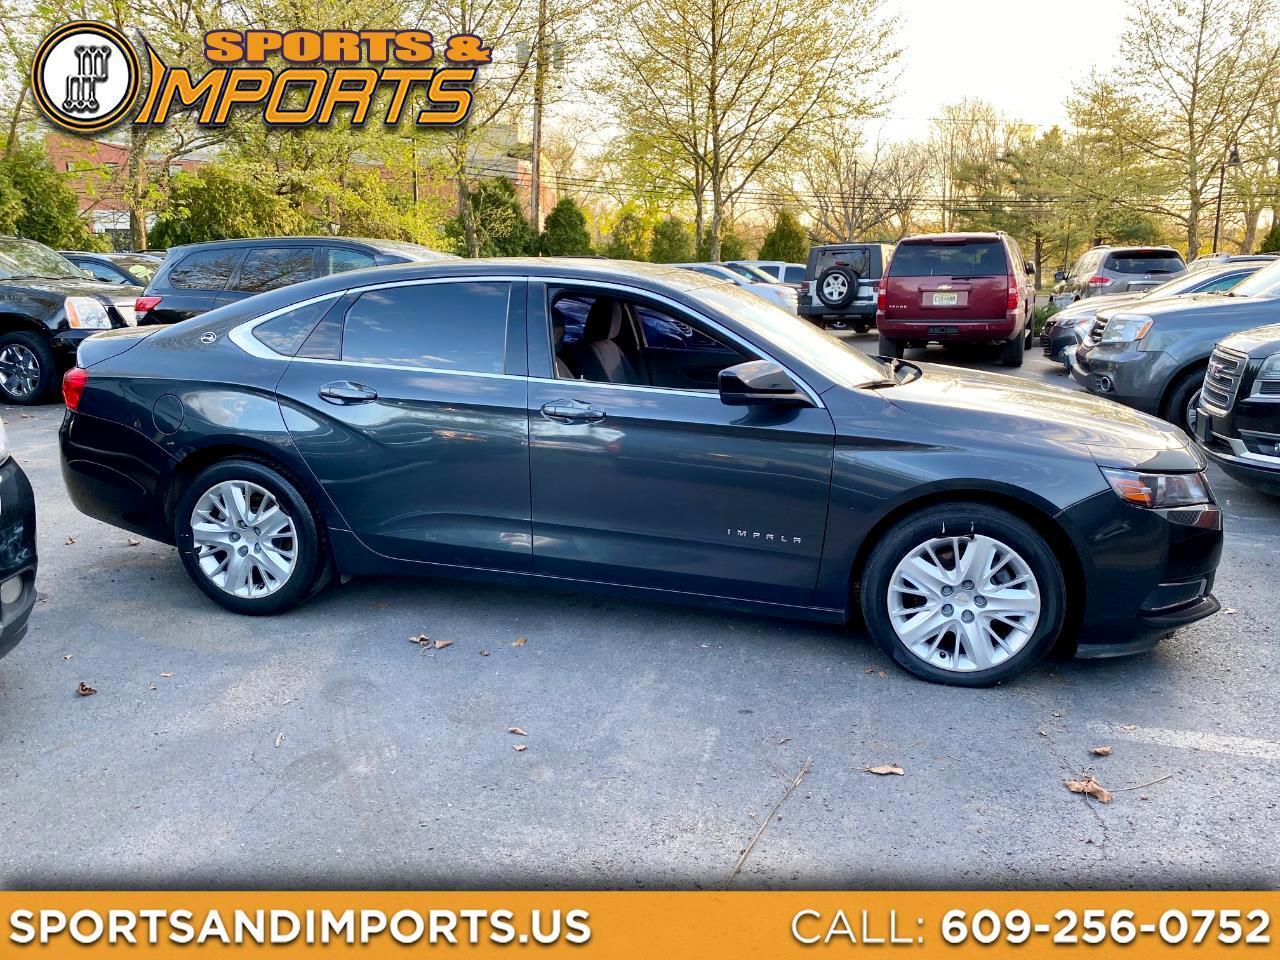 Chevrolet Impala 4dr Sdn LS Eco 2015